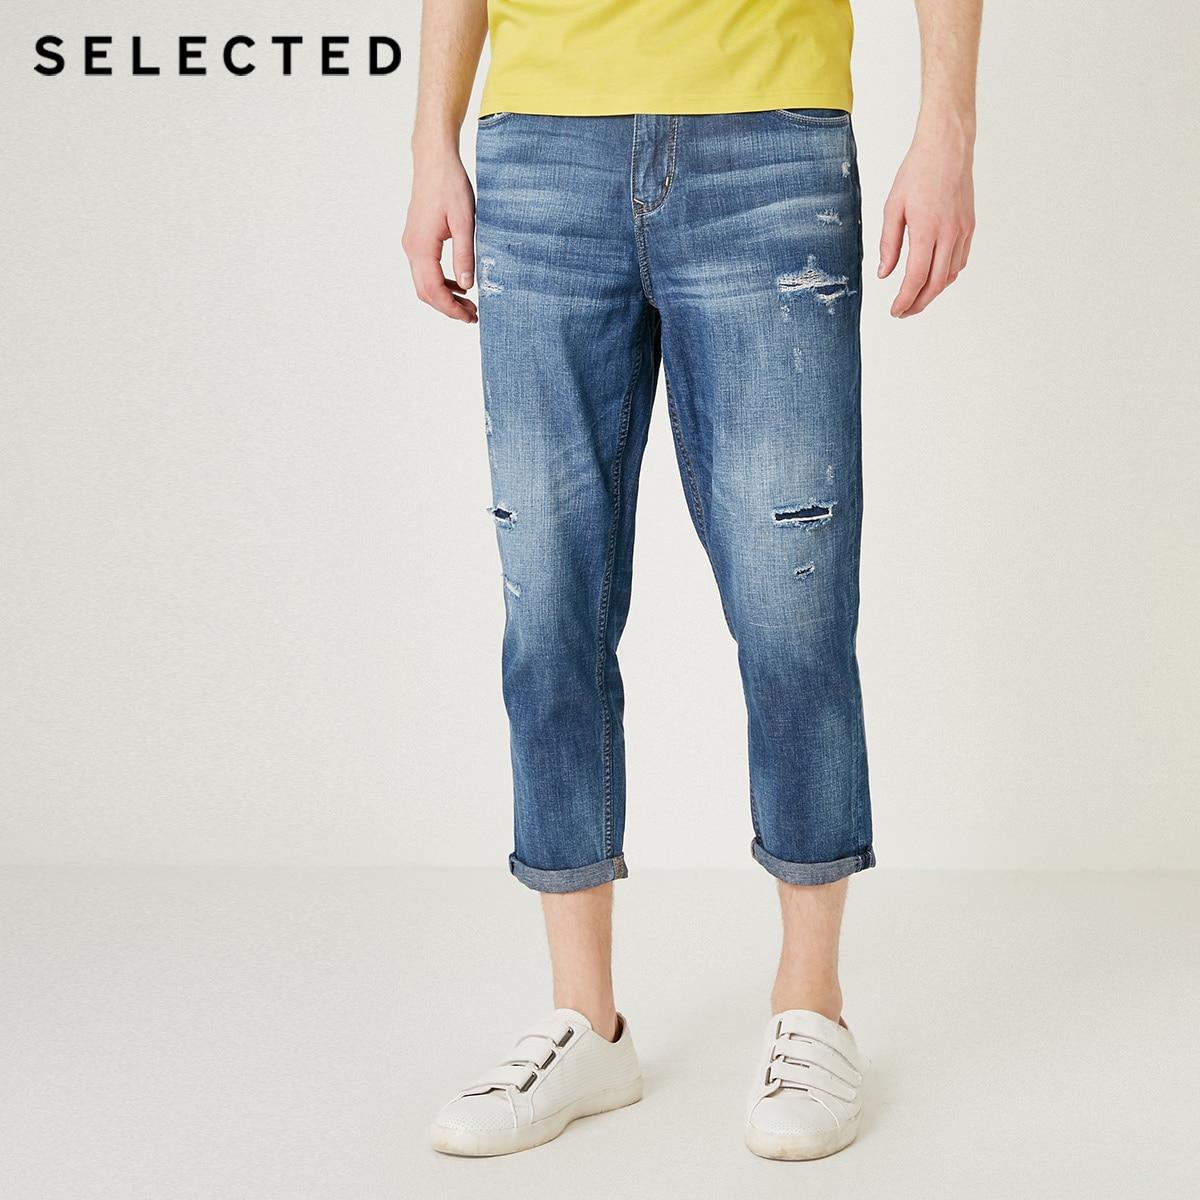 SELECTED Men's Loose Fit Denim Pants Casual Ripped Crop Jeans C|419232520